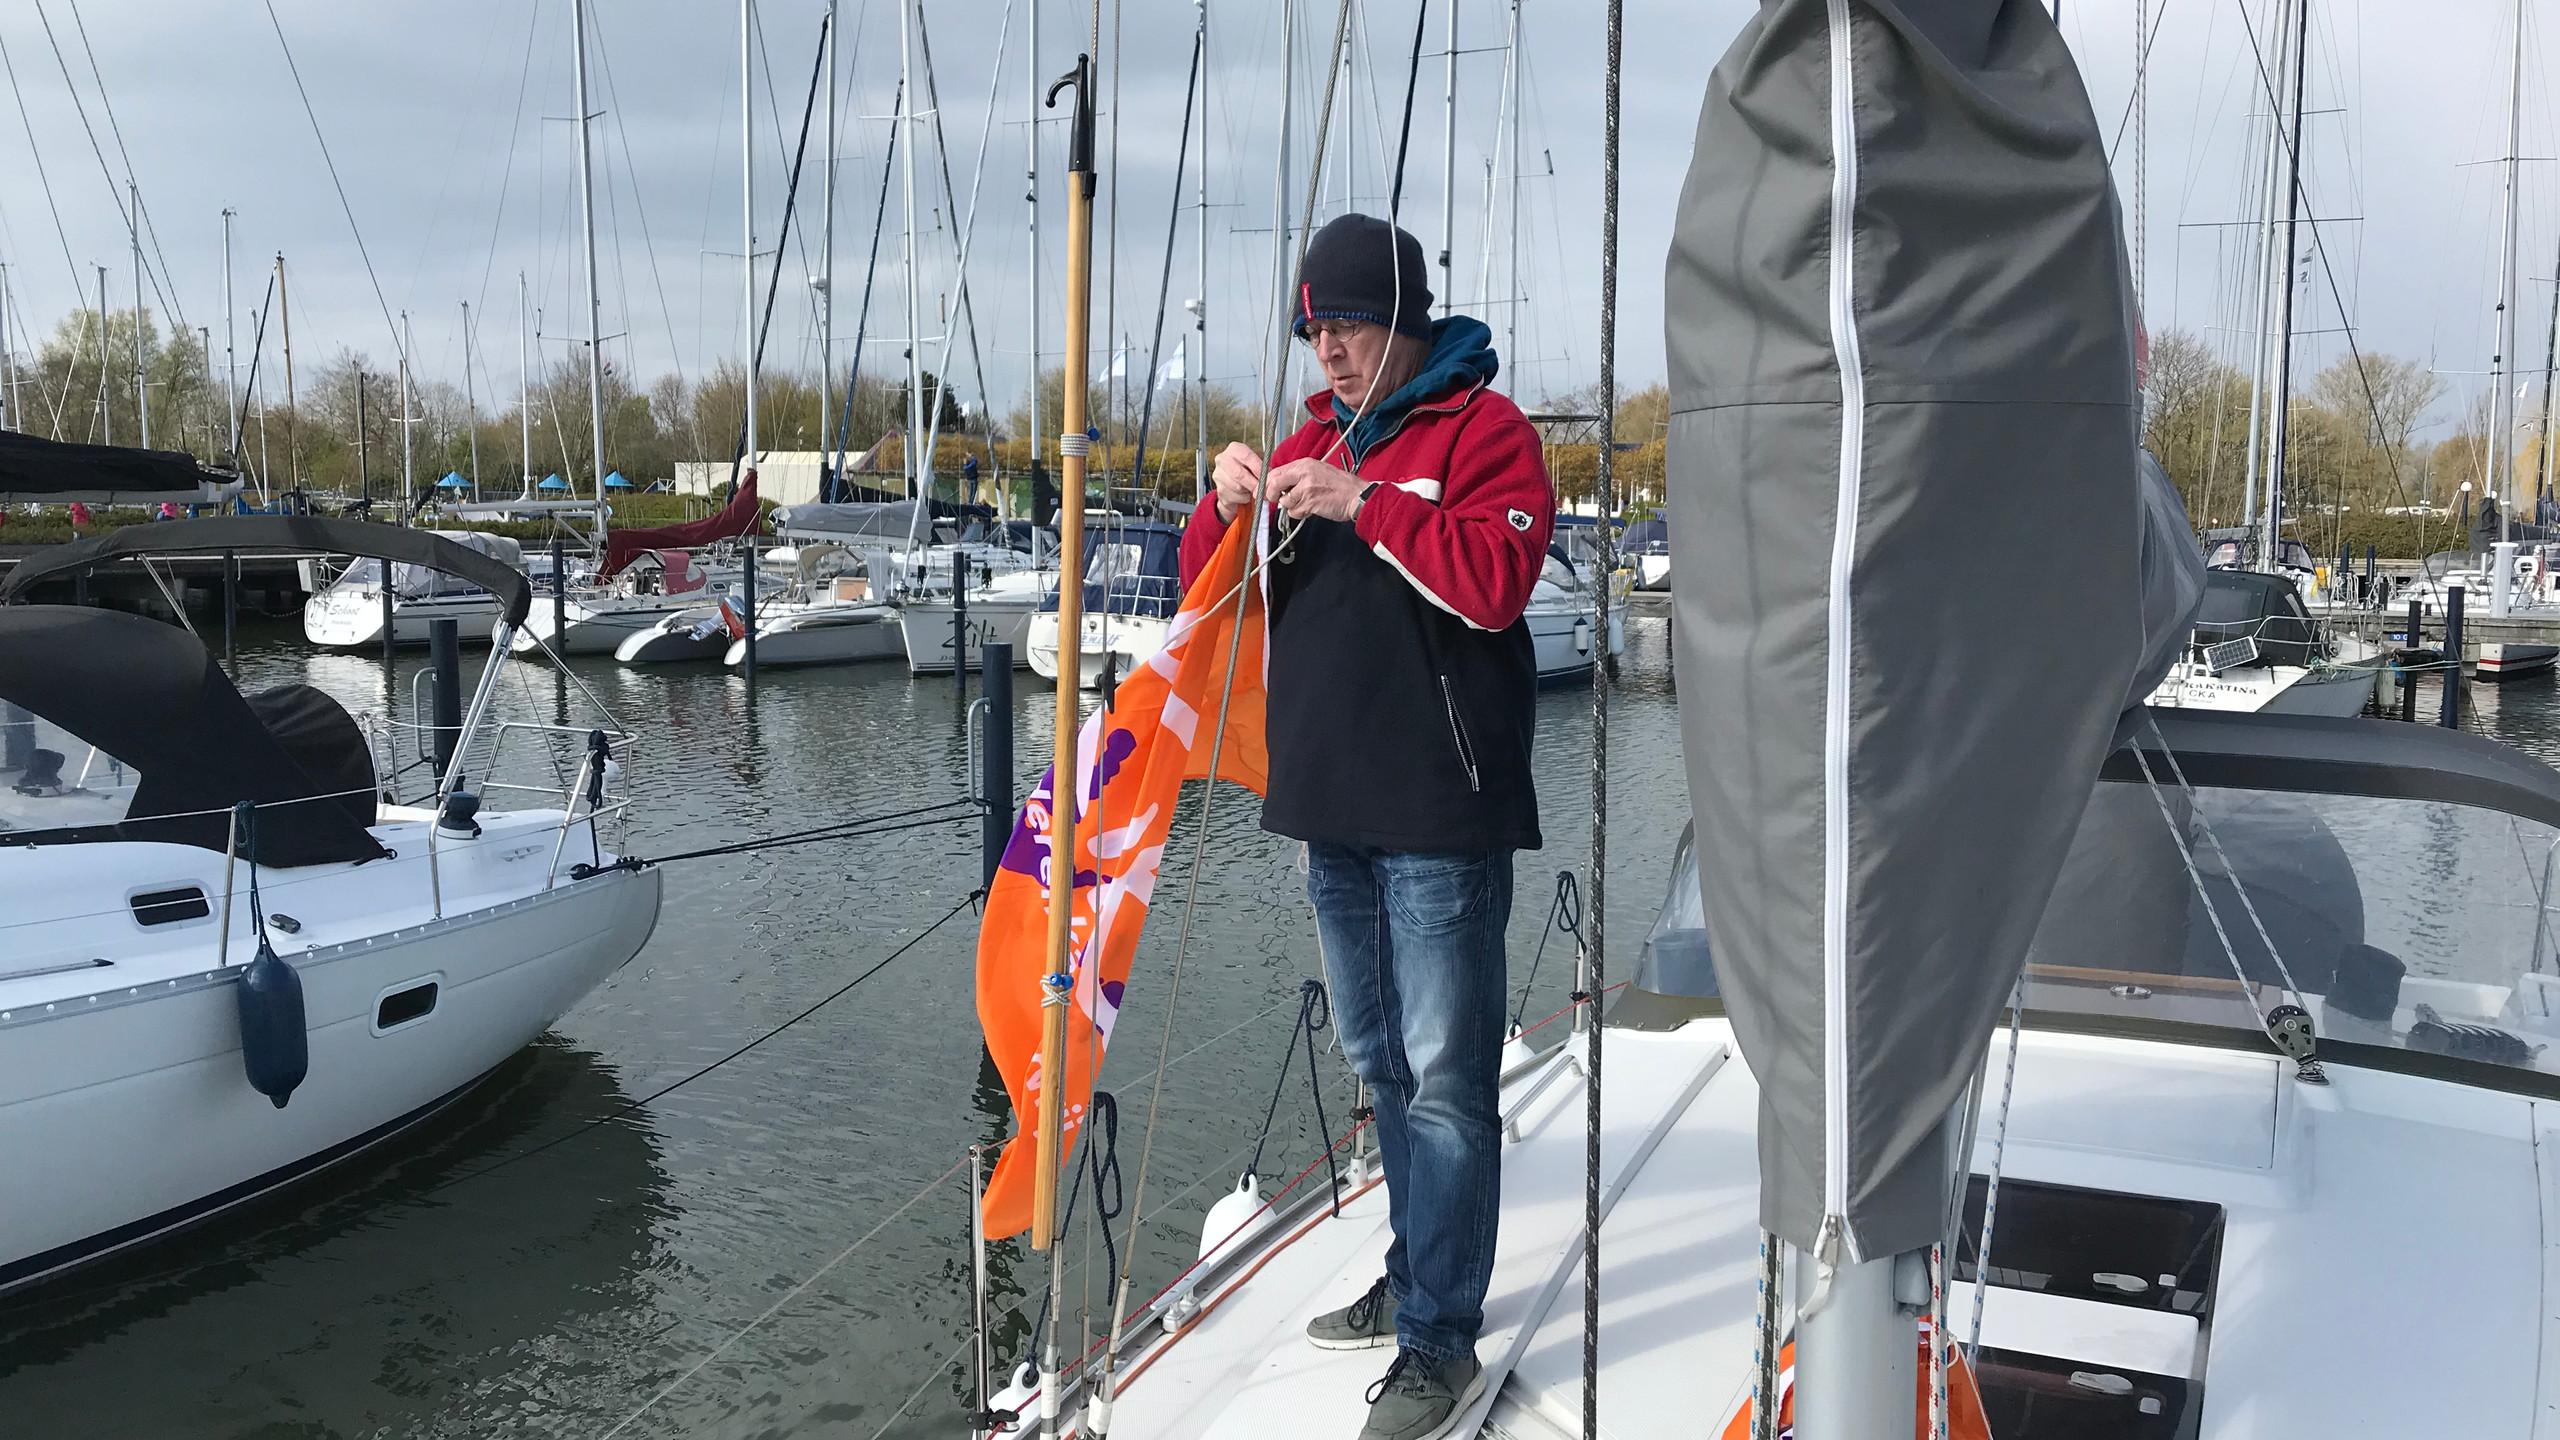 Attaching the KiKa flags